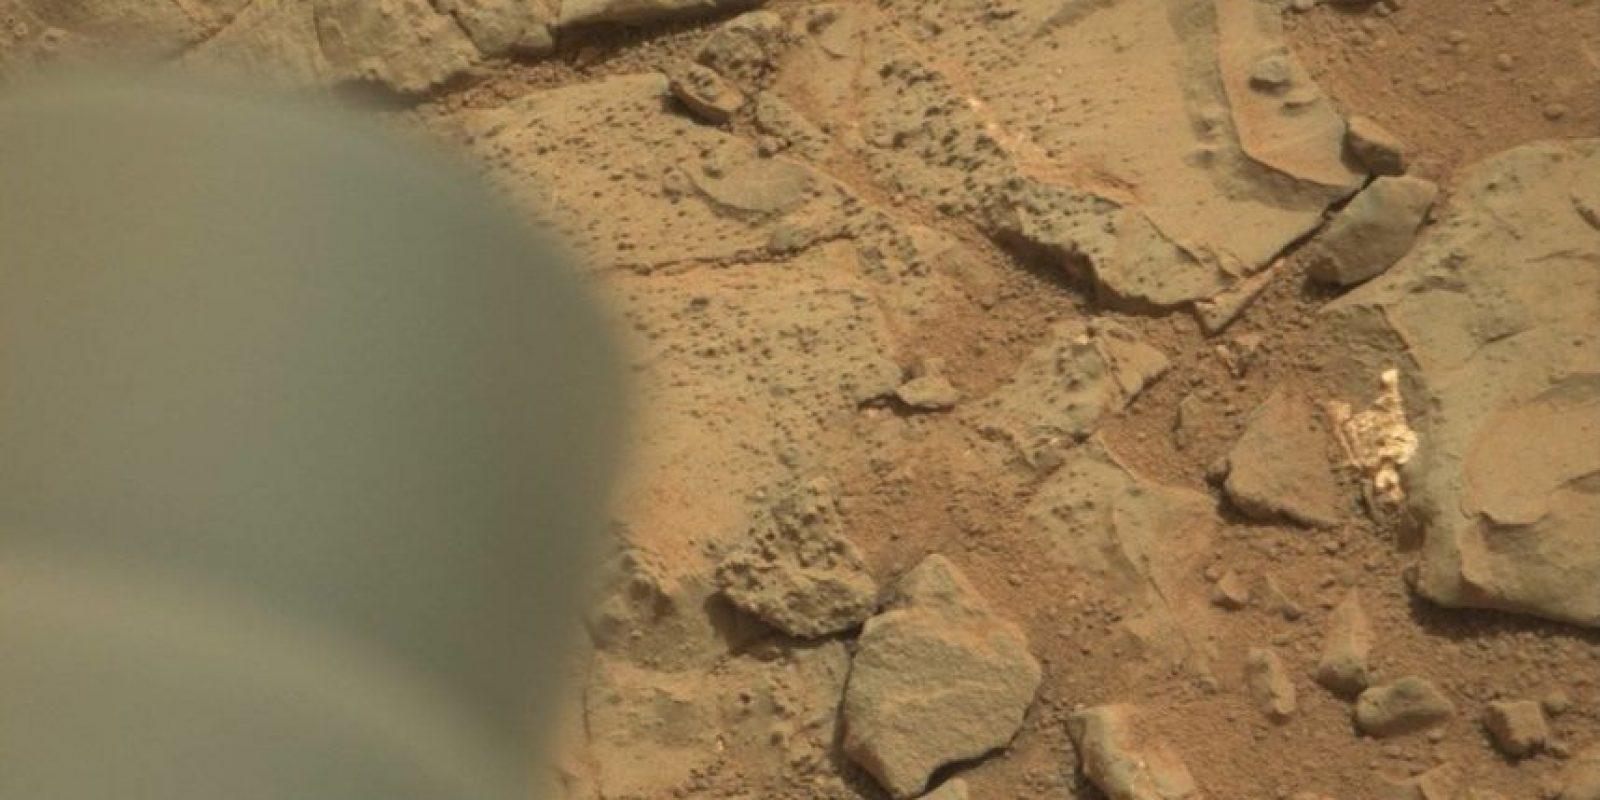 Esta es la imagen difundida por la NASA Foto:original en http://mars.jpl.nasa.gov/msl-raw-images/msss/00153/mcam/0153MR0008470180201260E01_DXXX.jpg